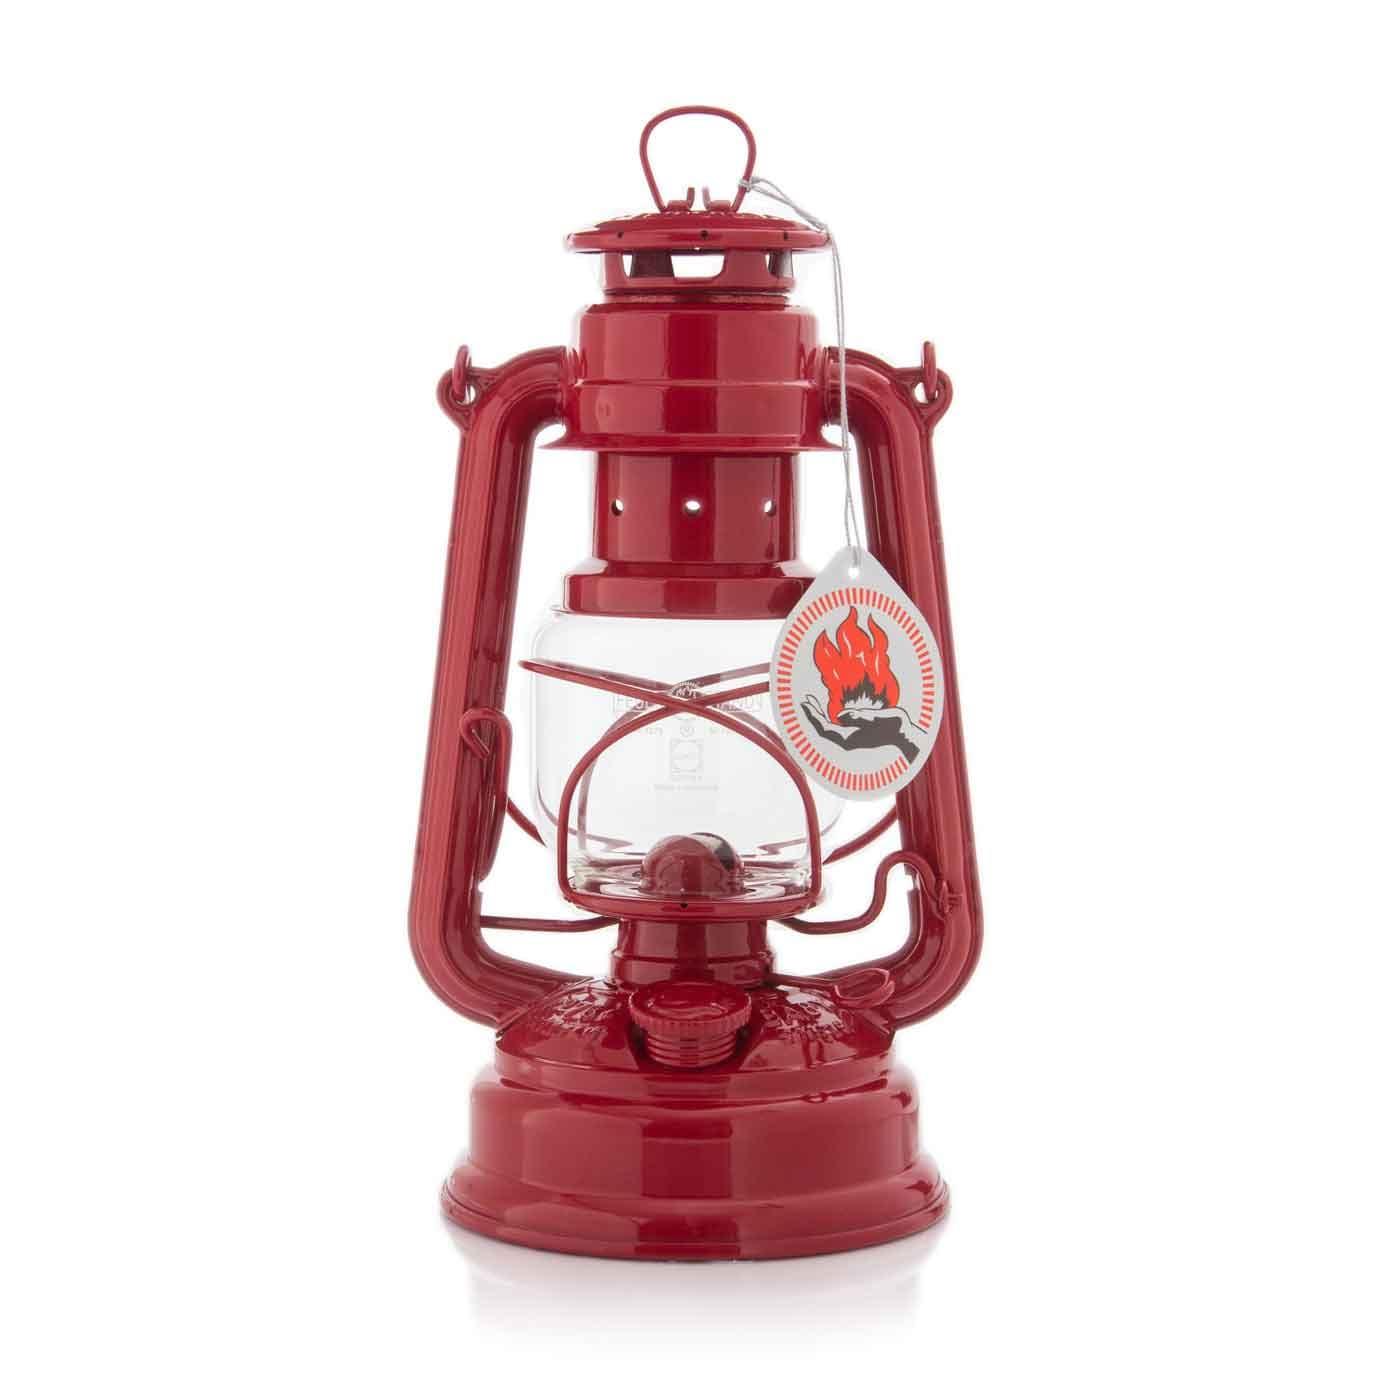 Dr33fjblng feuerhand feuerhand lantern 0 original